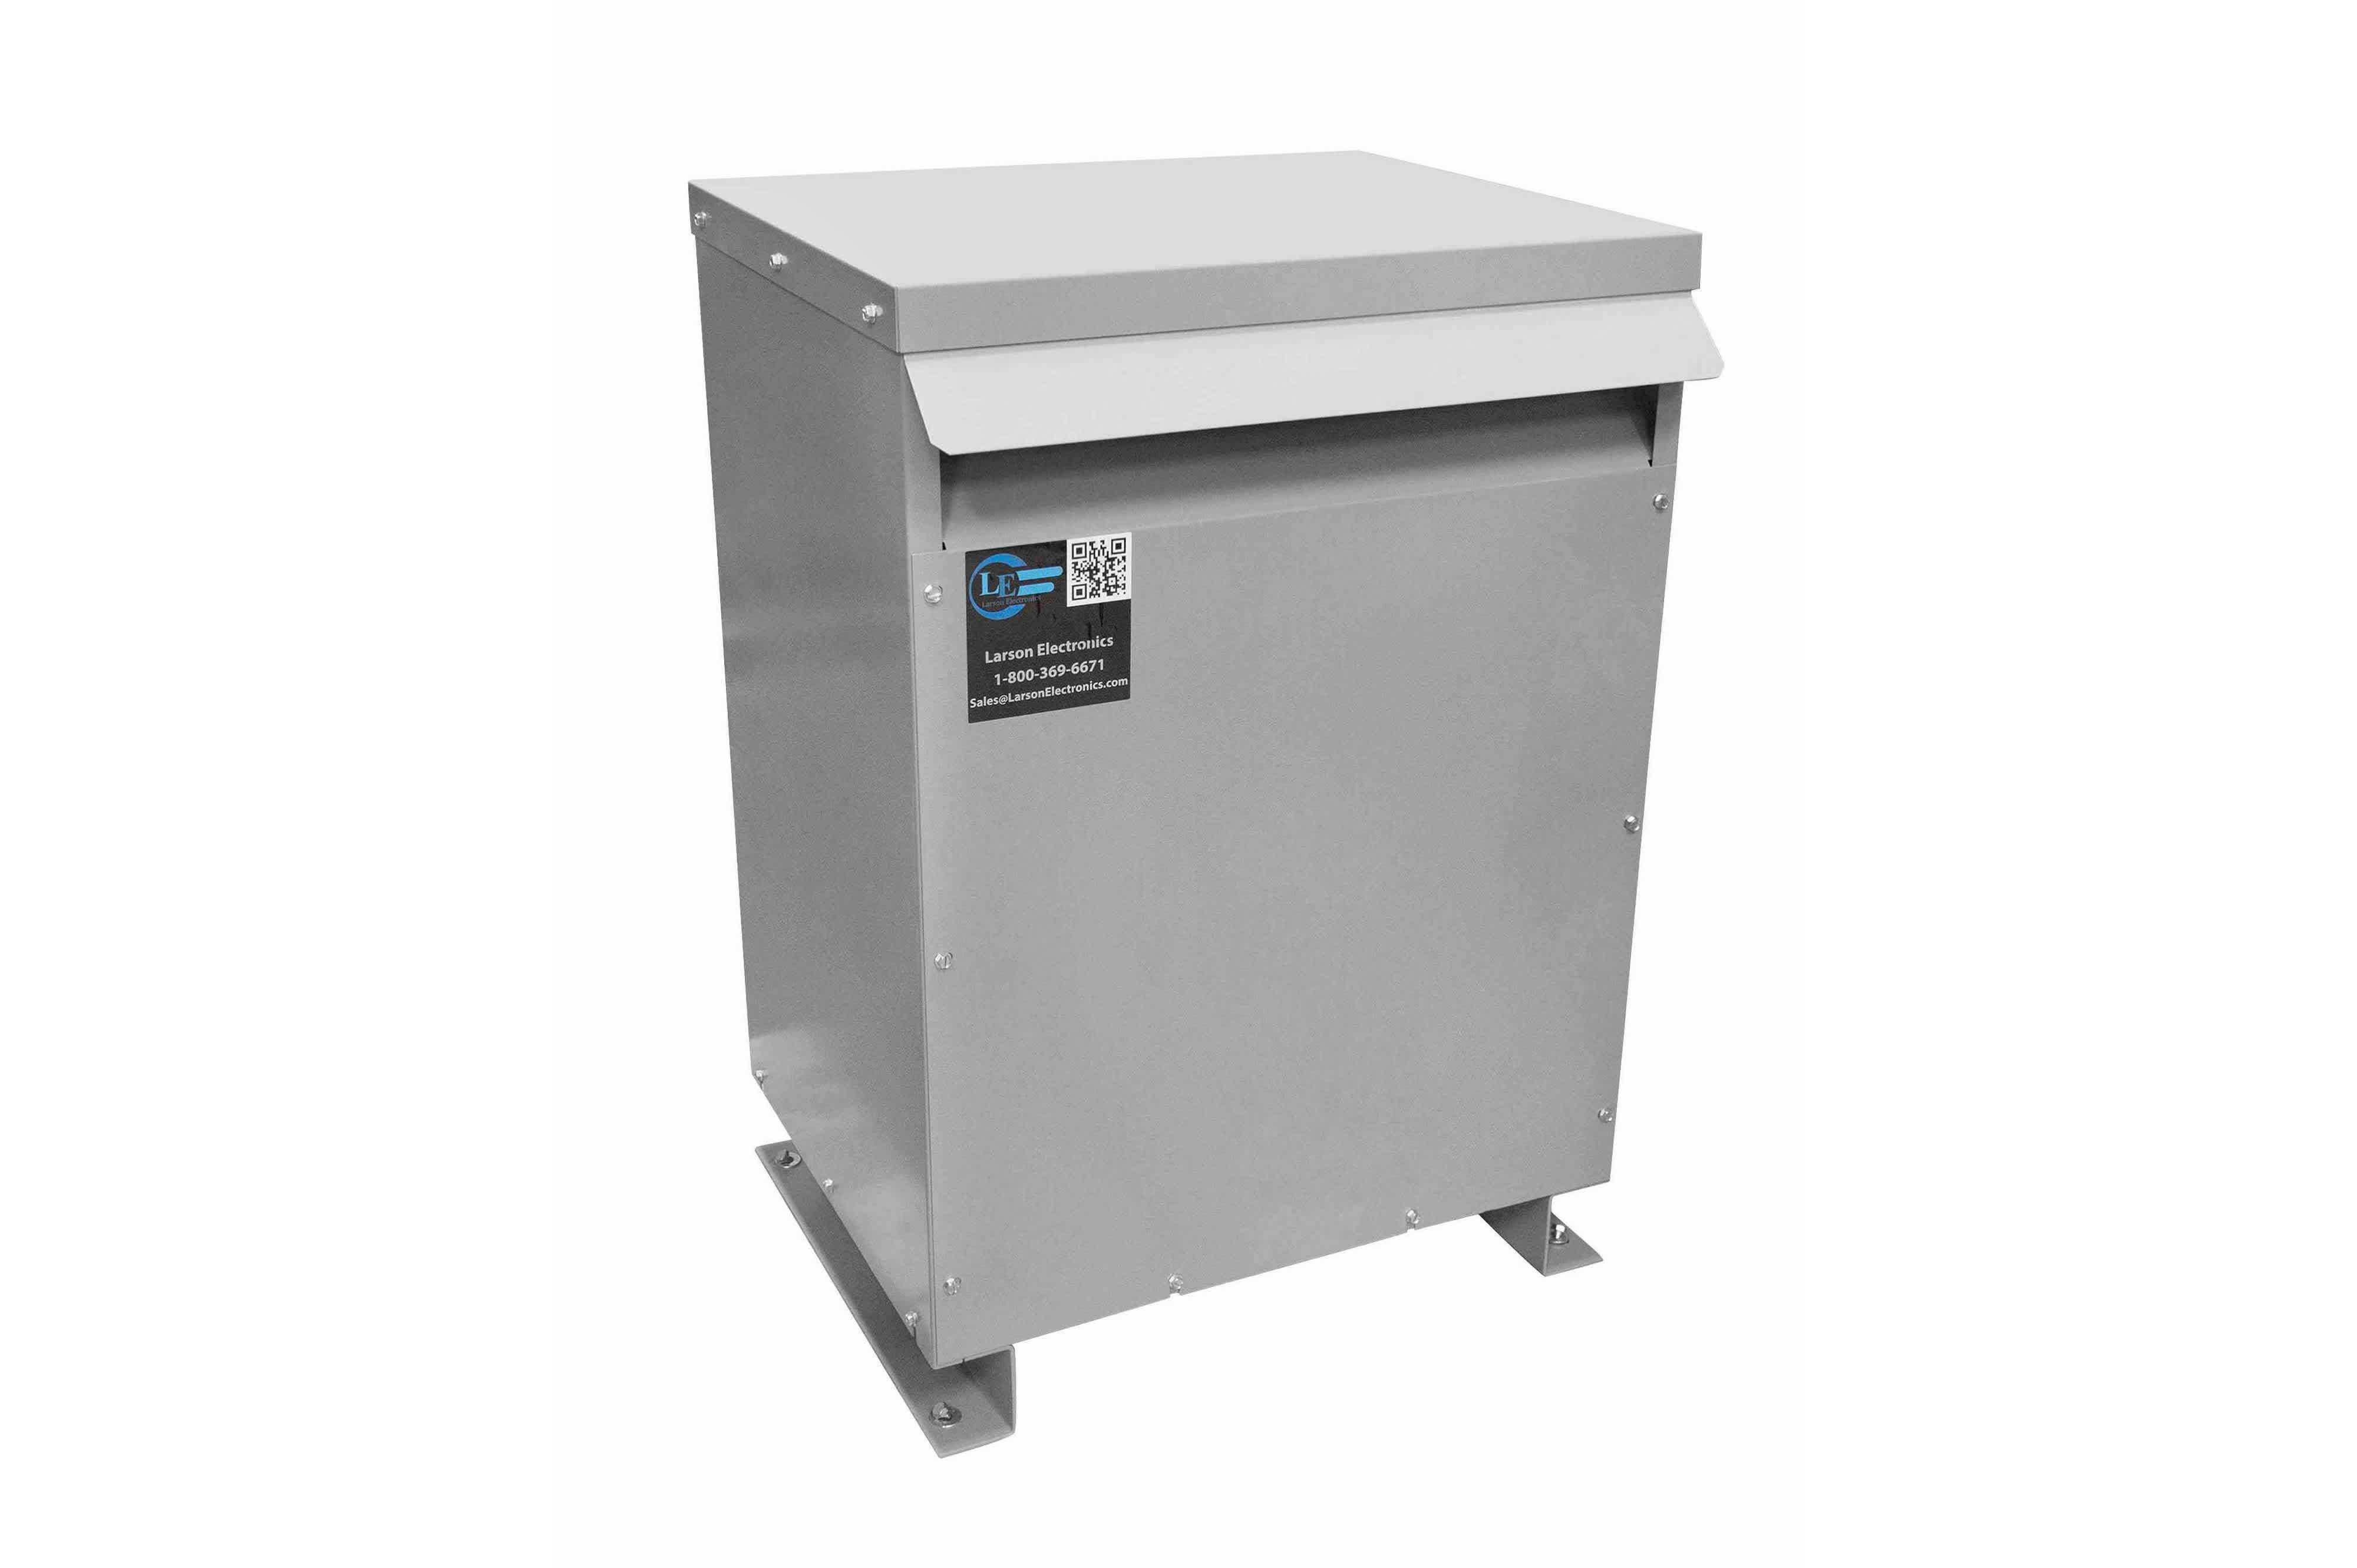 110 kVA 3PH Isolation Transformer, 380V Wye Primary, 600Y/347 Wye-N Secondary, N3R, Ventilated, 60 Hz